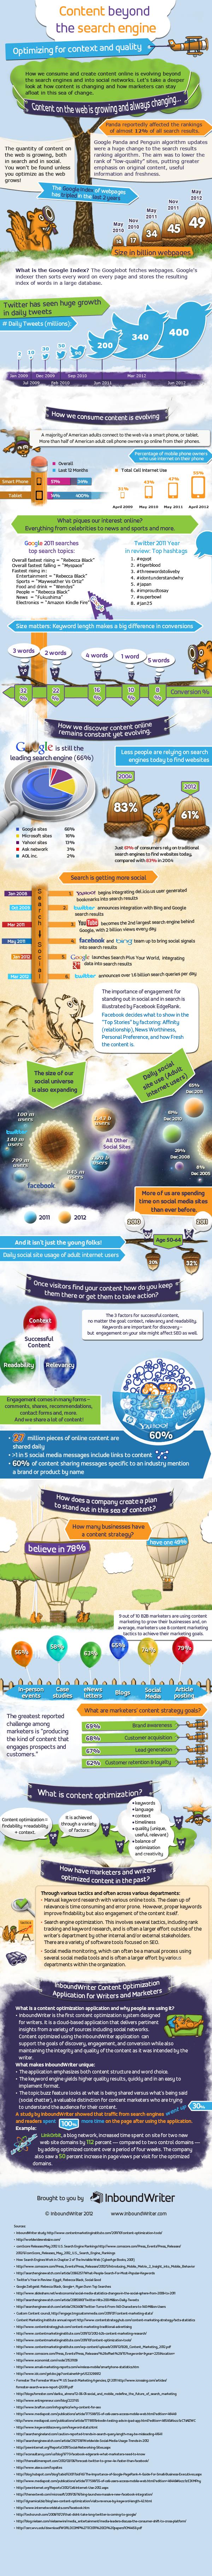 InboundWriter Infographic